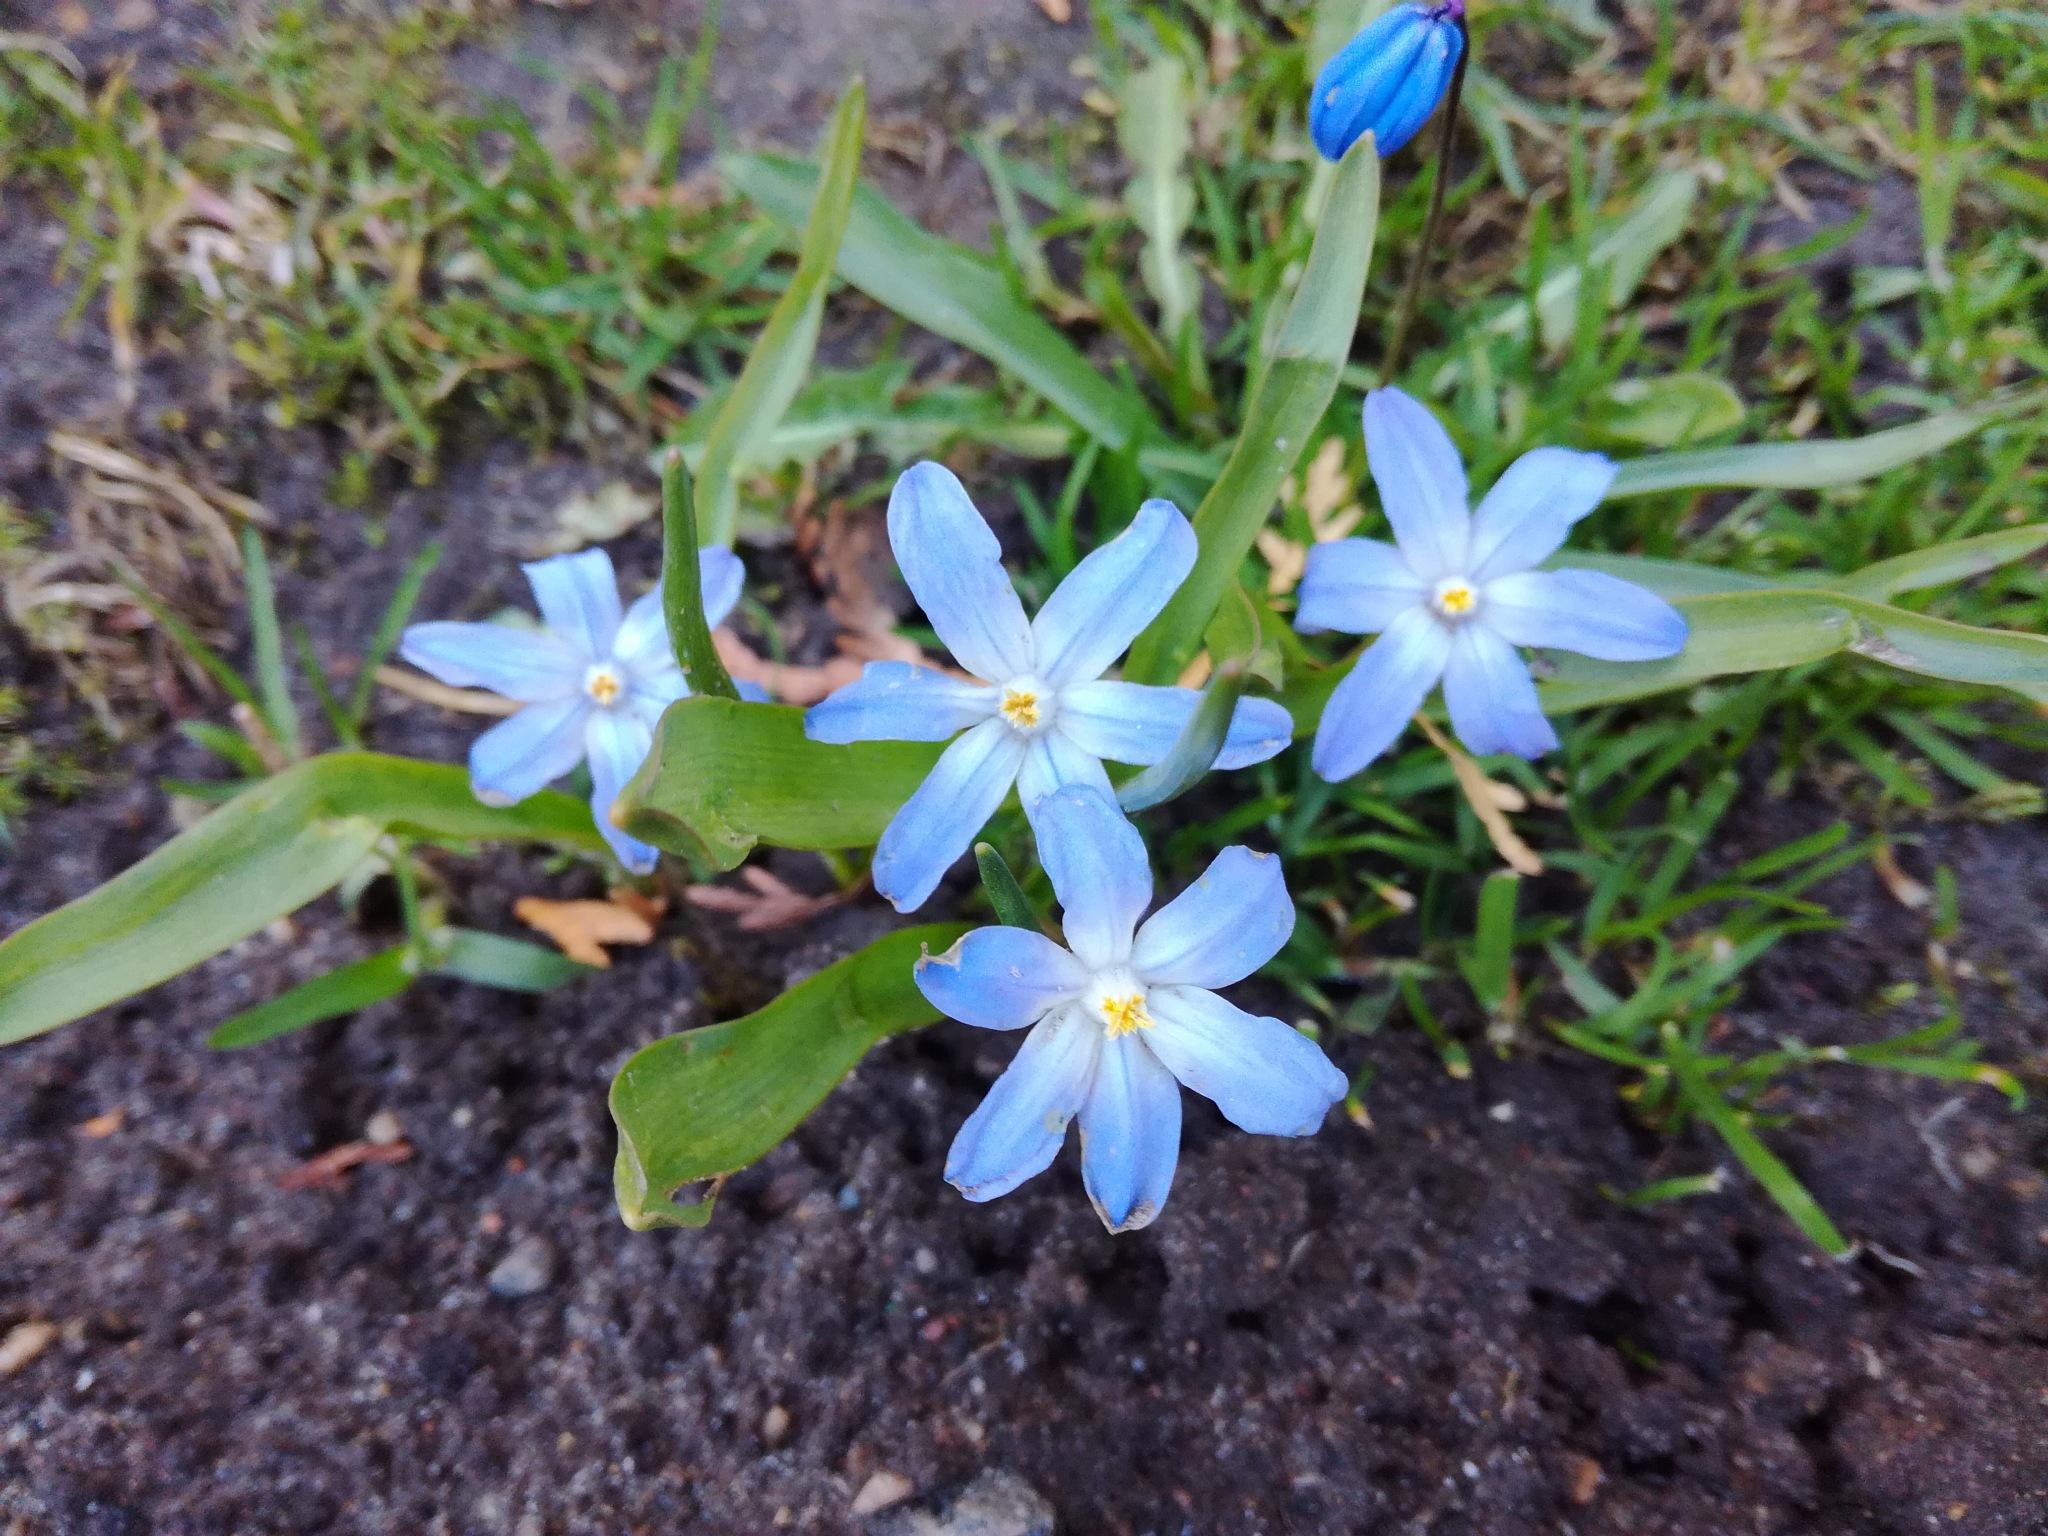 Spring flowers by uzkuraitiene62